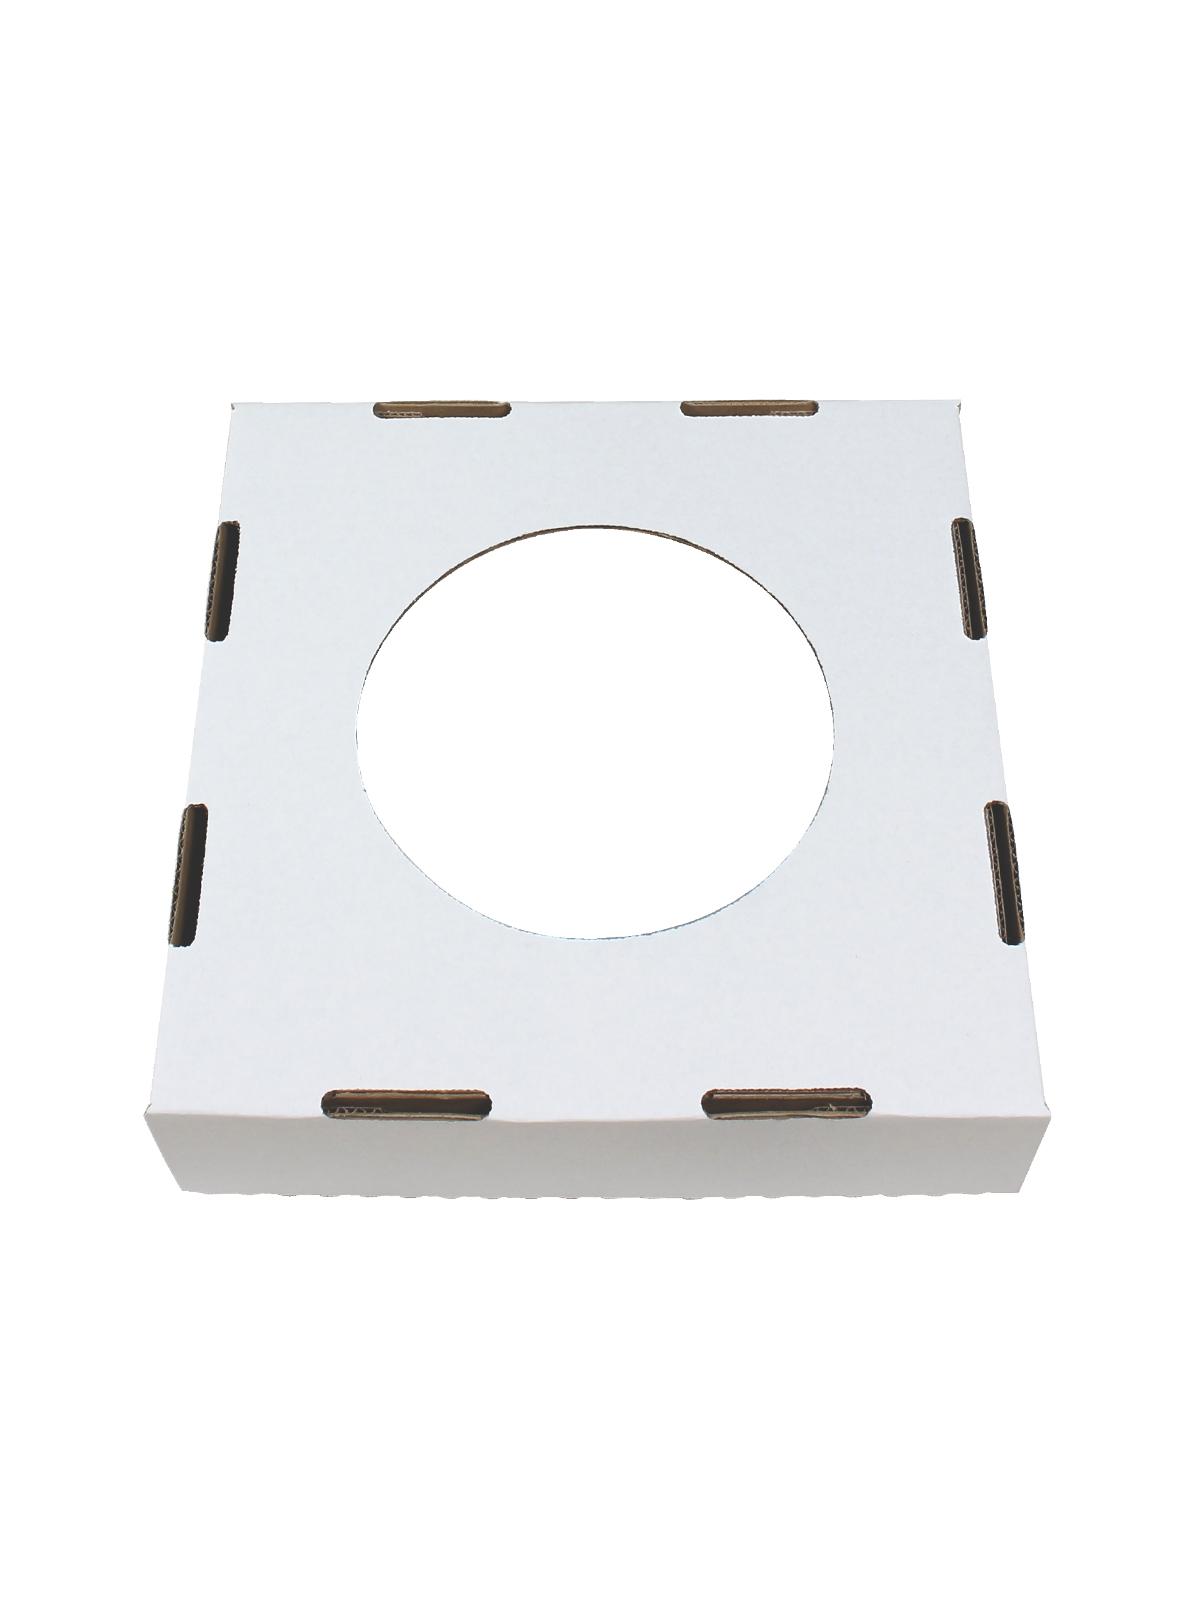 CORRUGATED BIN LID 10 PACK - FULL